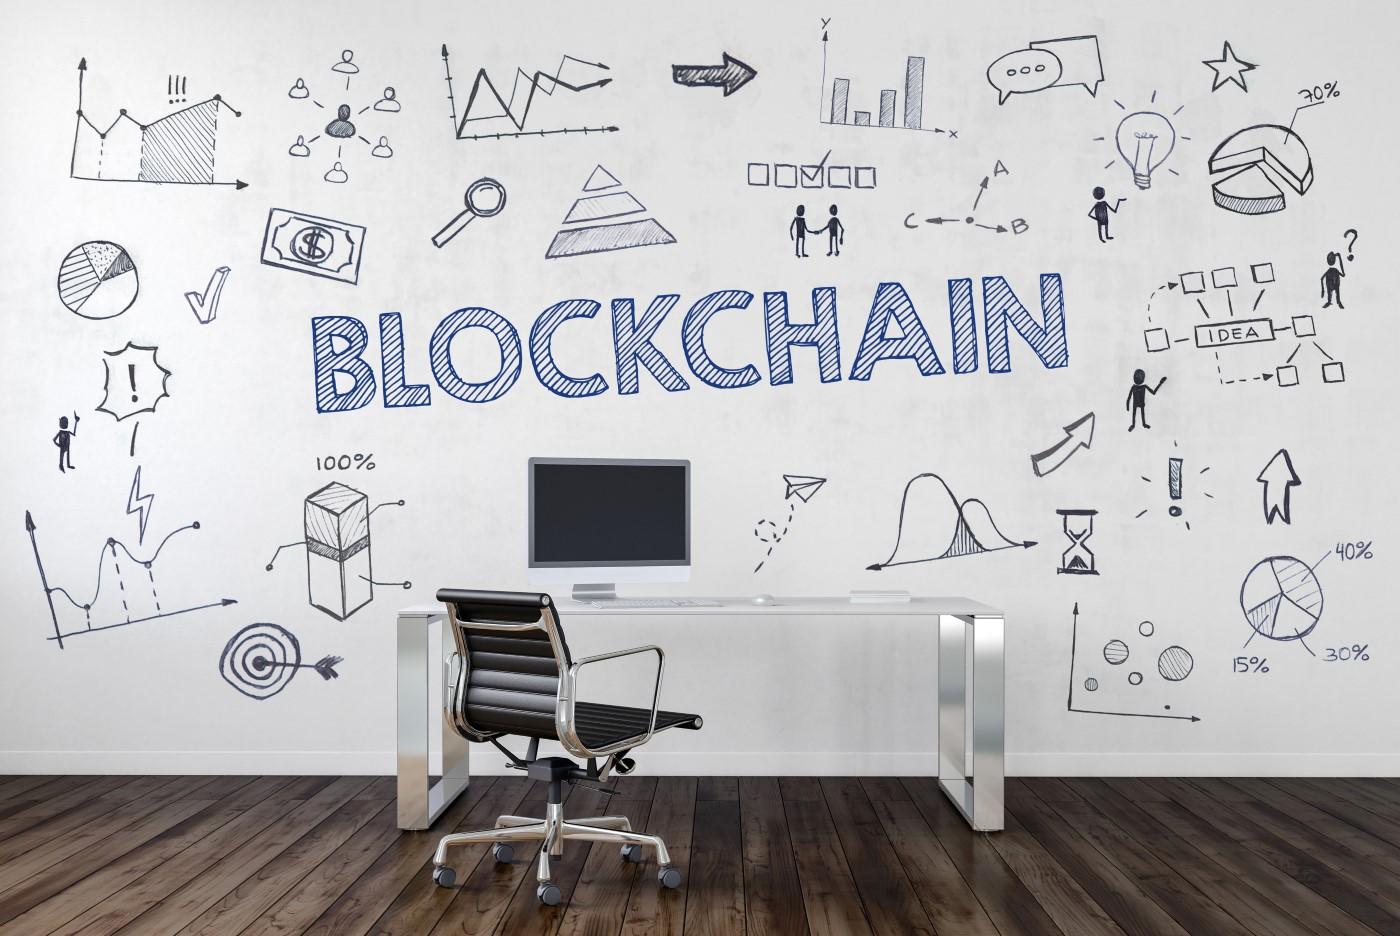 banco-eventos-hackaton-tecnologia